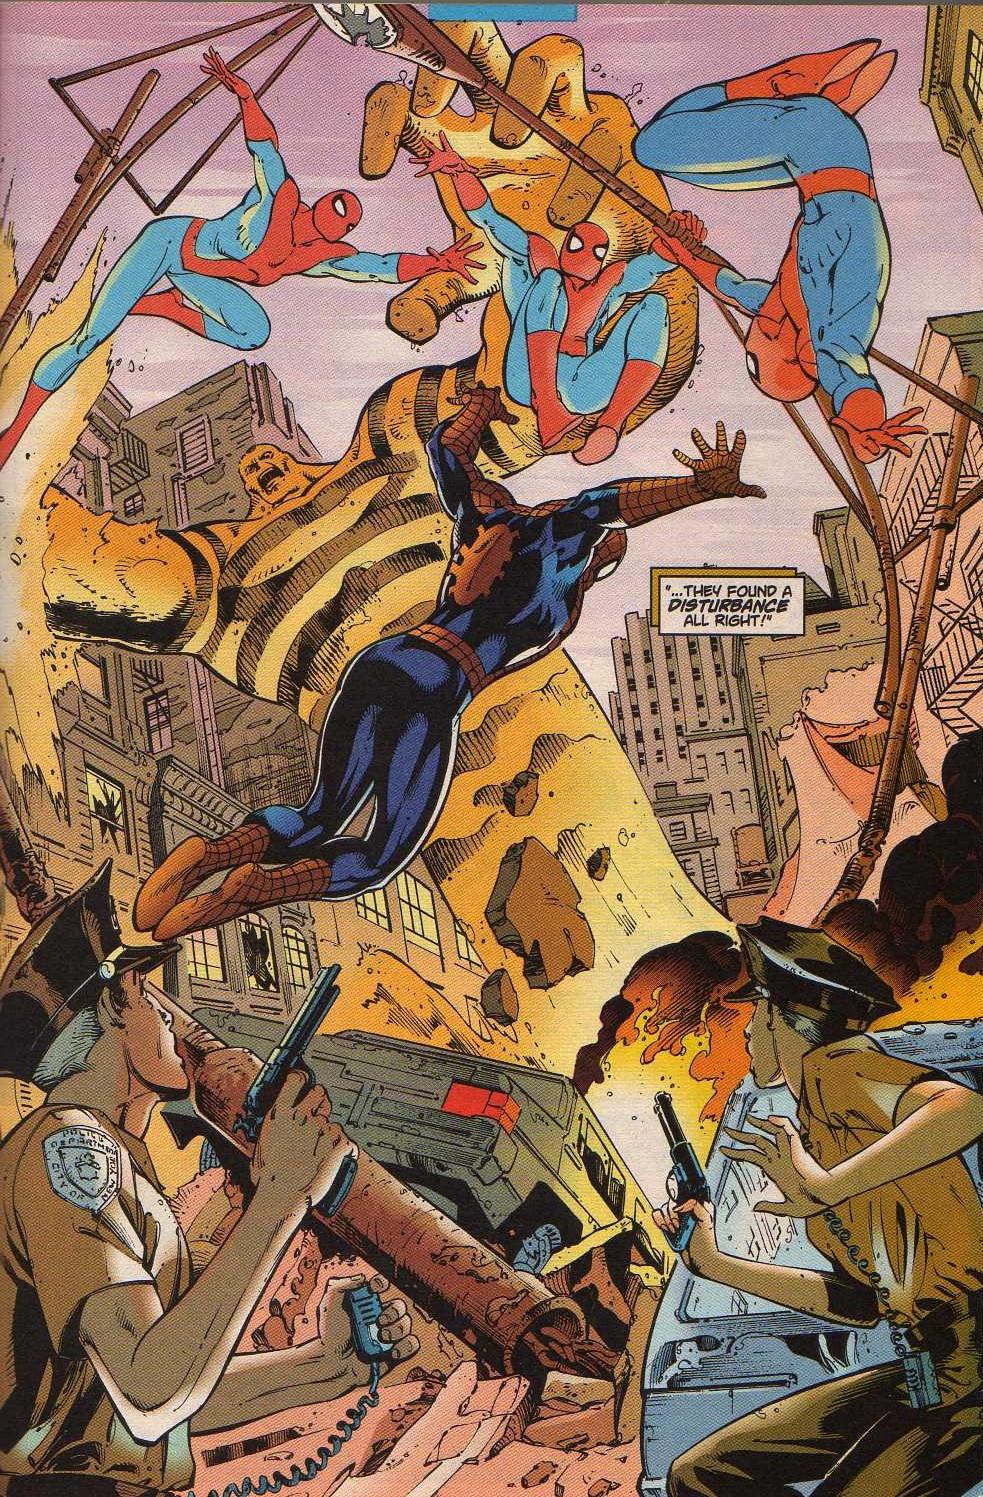 Details about  /Spider-Man Mecha Standard Color Edition Figure Statue Peter Parker 2 PG Manga